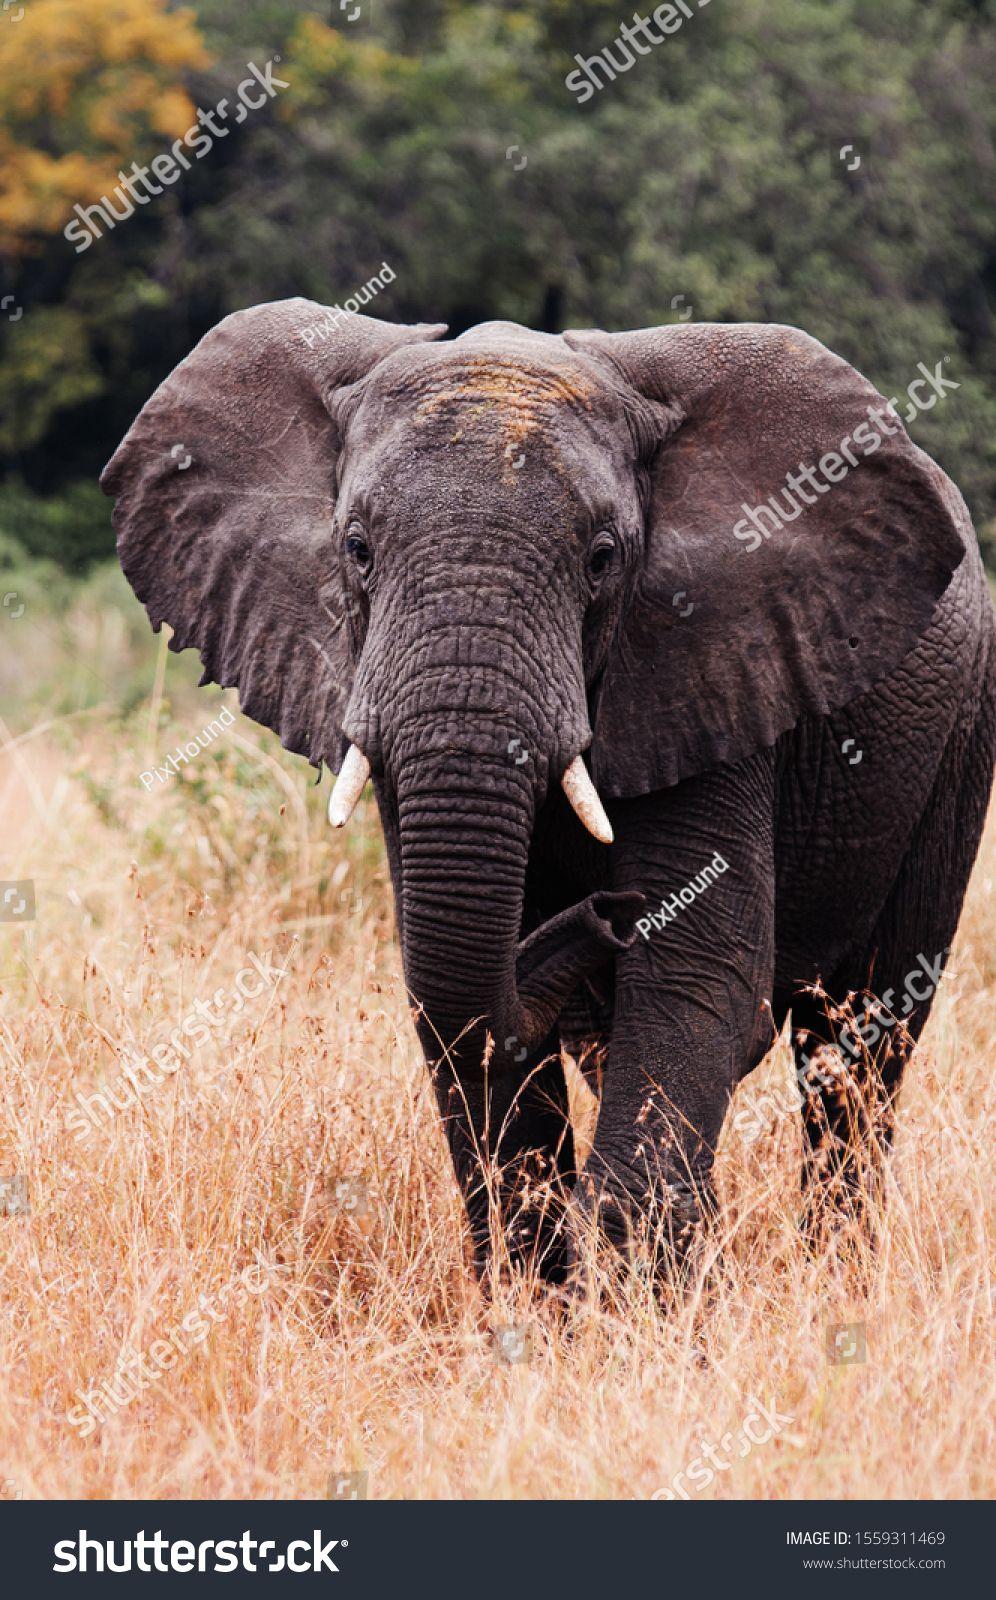 Large African Elephants in golden grass field in Grumeti reserve, Serengeti Savanna forest in Tanzania - African safari wildlife watching trip #Ad , #ad, #field#grass#reserve#Grumeti